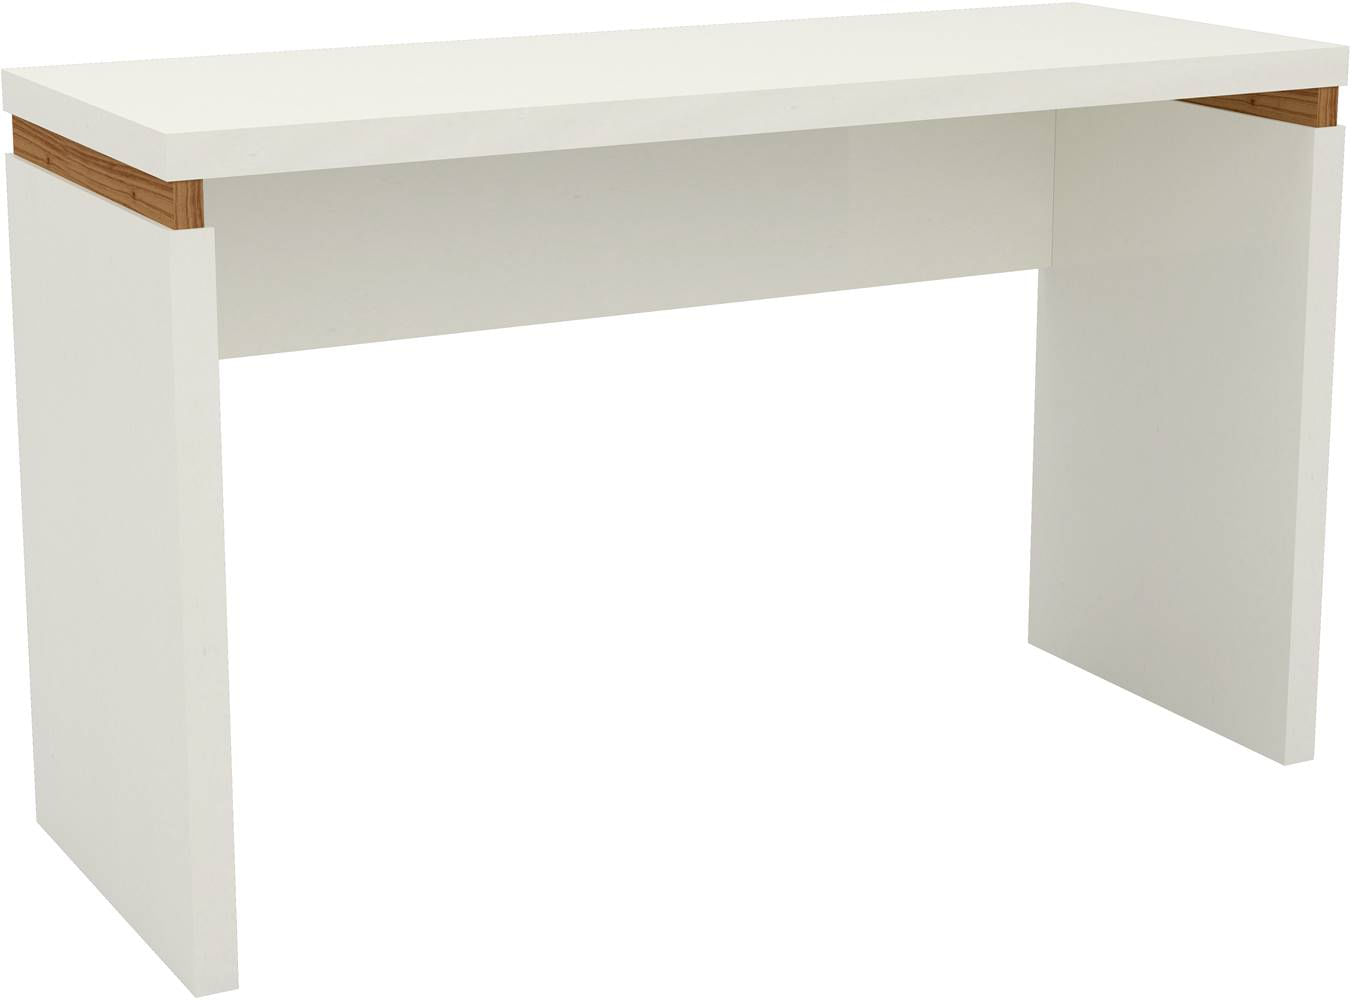 Mesa de Escritorio Viena 1,20 MT cor Off White com Freijo - 51880